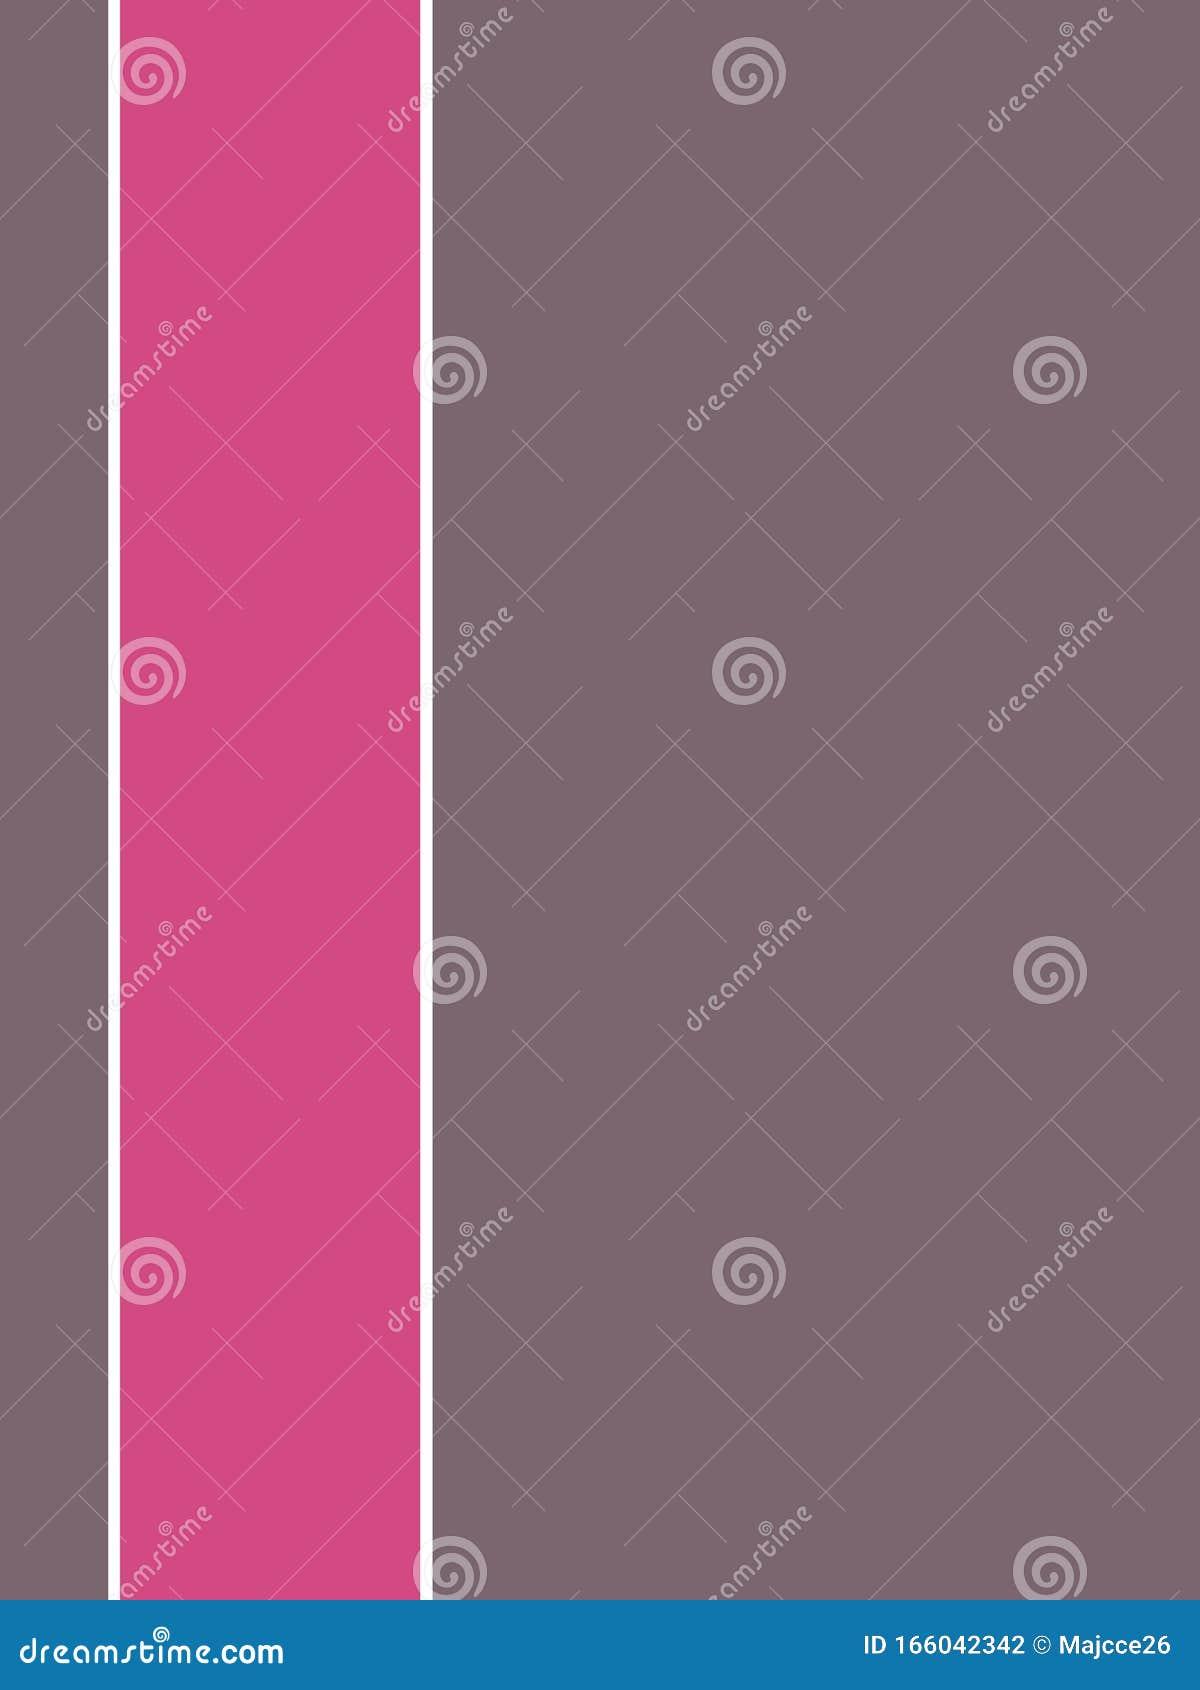 Background Abstract Line Pattern Lines Card Texture Geometric Wallpaper 库存例证 插画包括有wallpaper Card